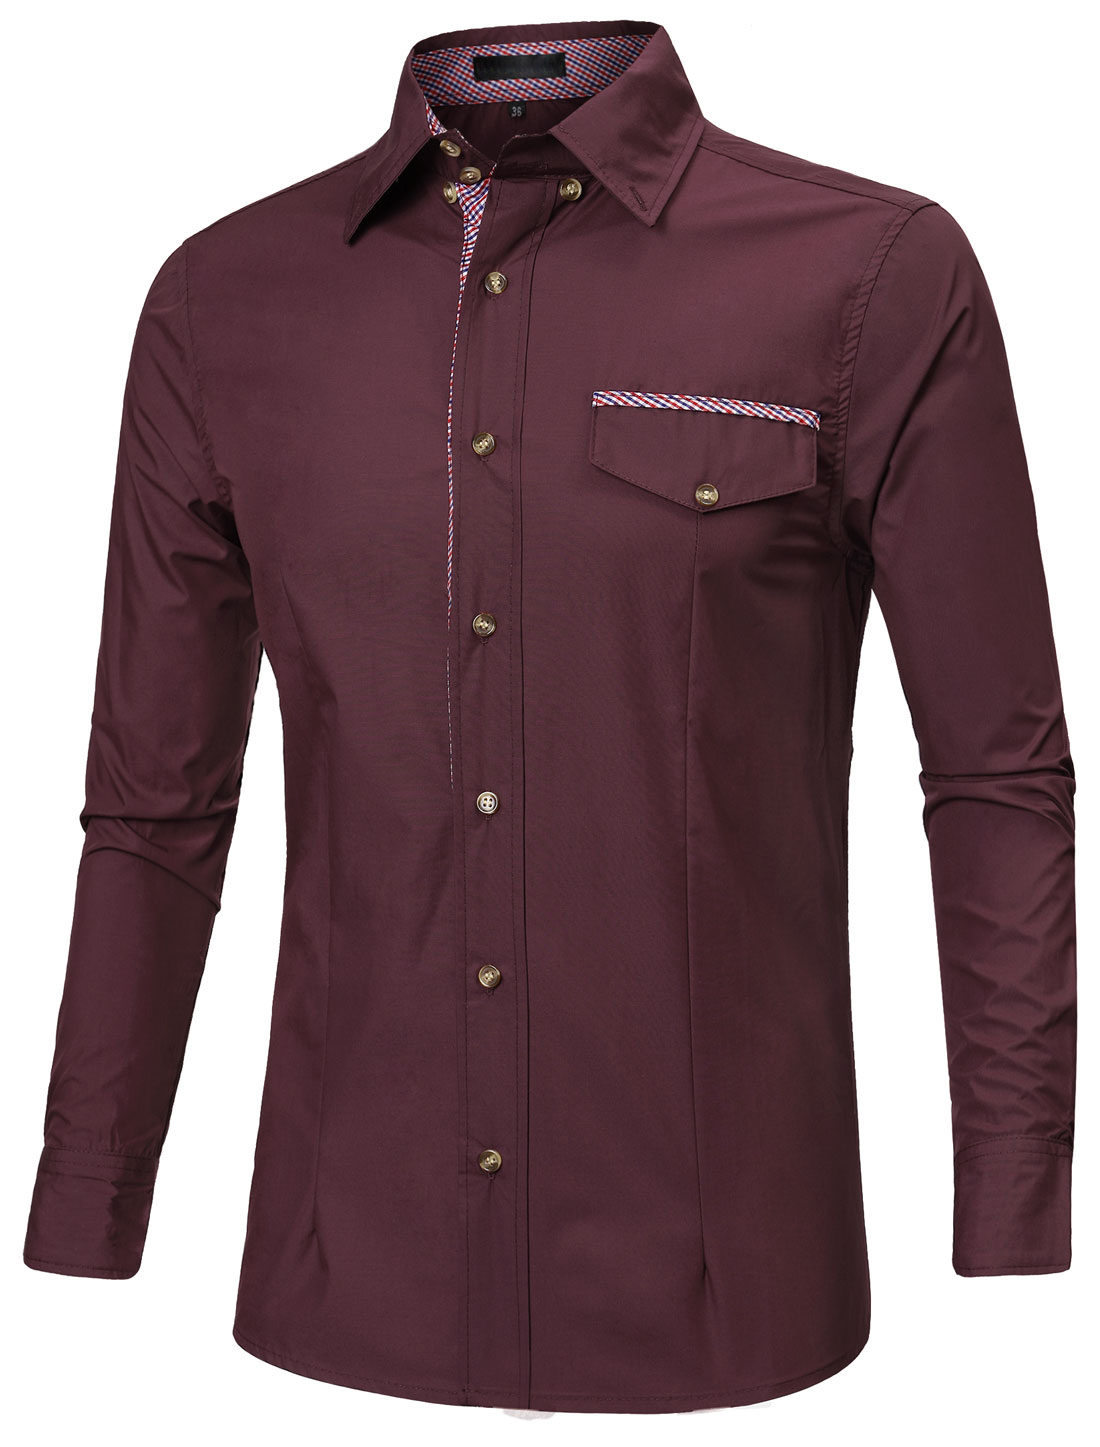 Men Point Collar Button Down Long Sleeves Plaid Print Slim Fit Shirts Burgundy L